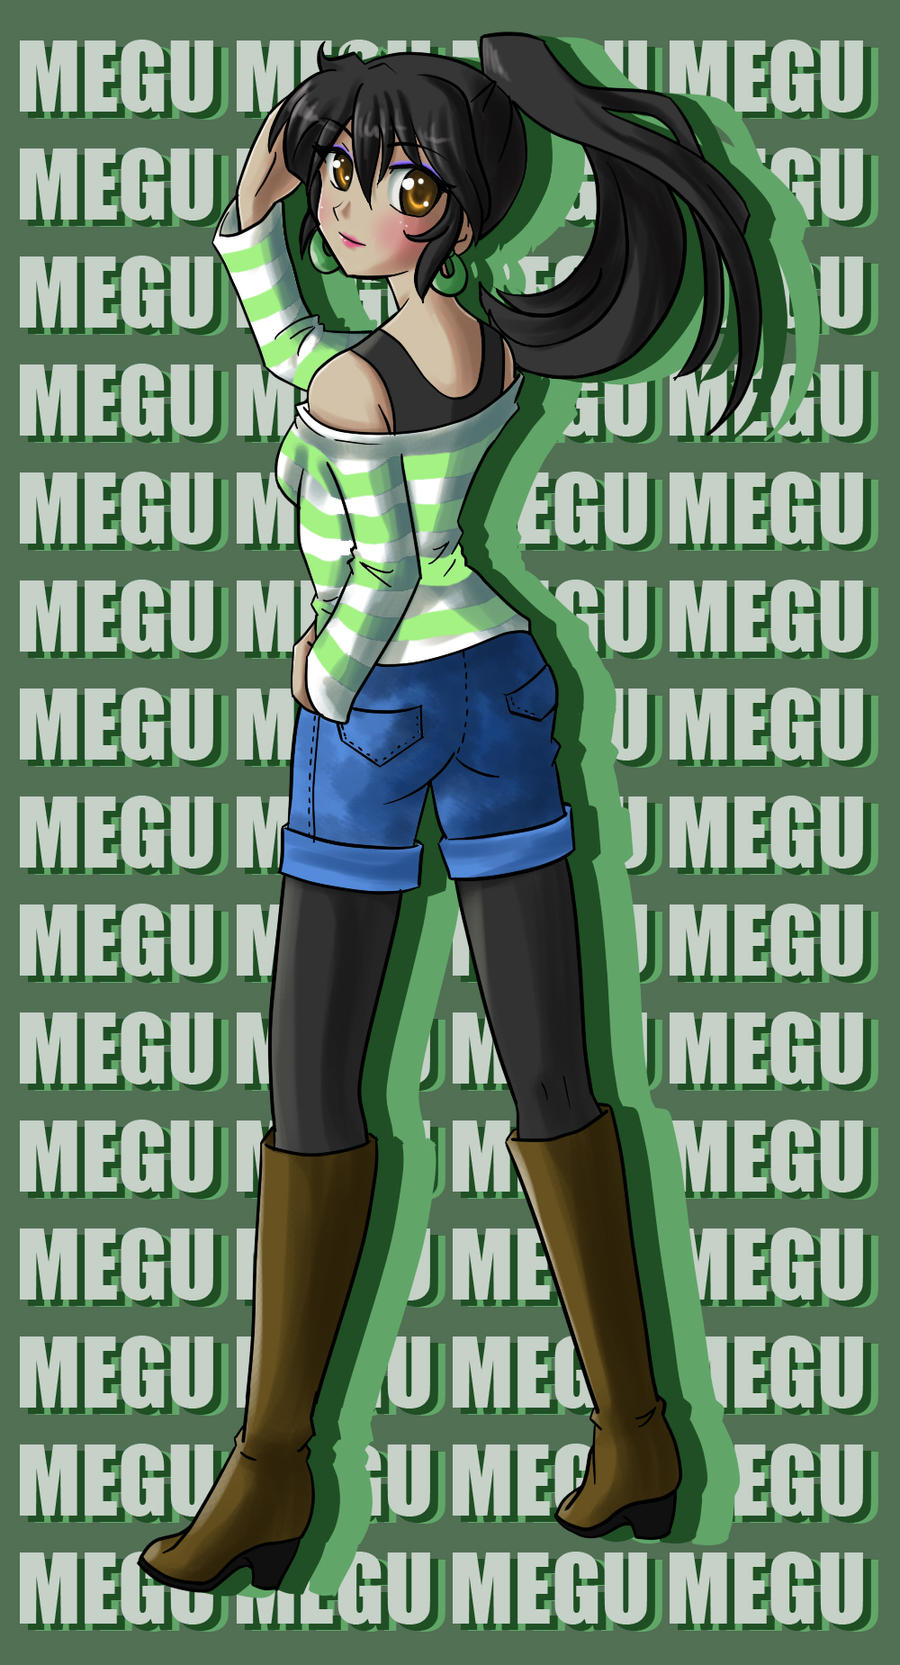 Megumita0w0's Profile Picture